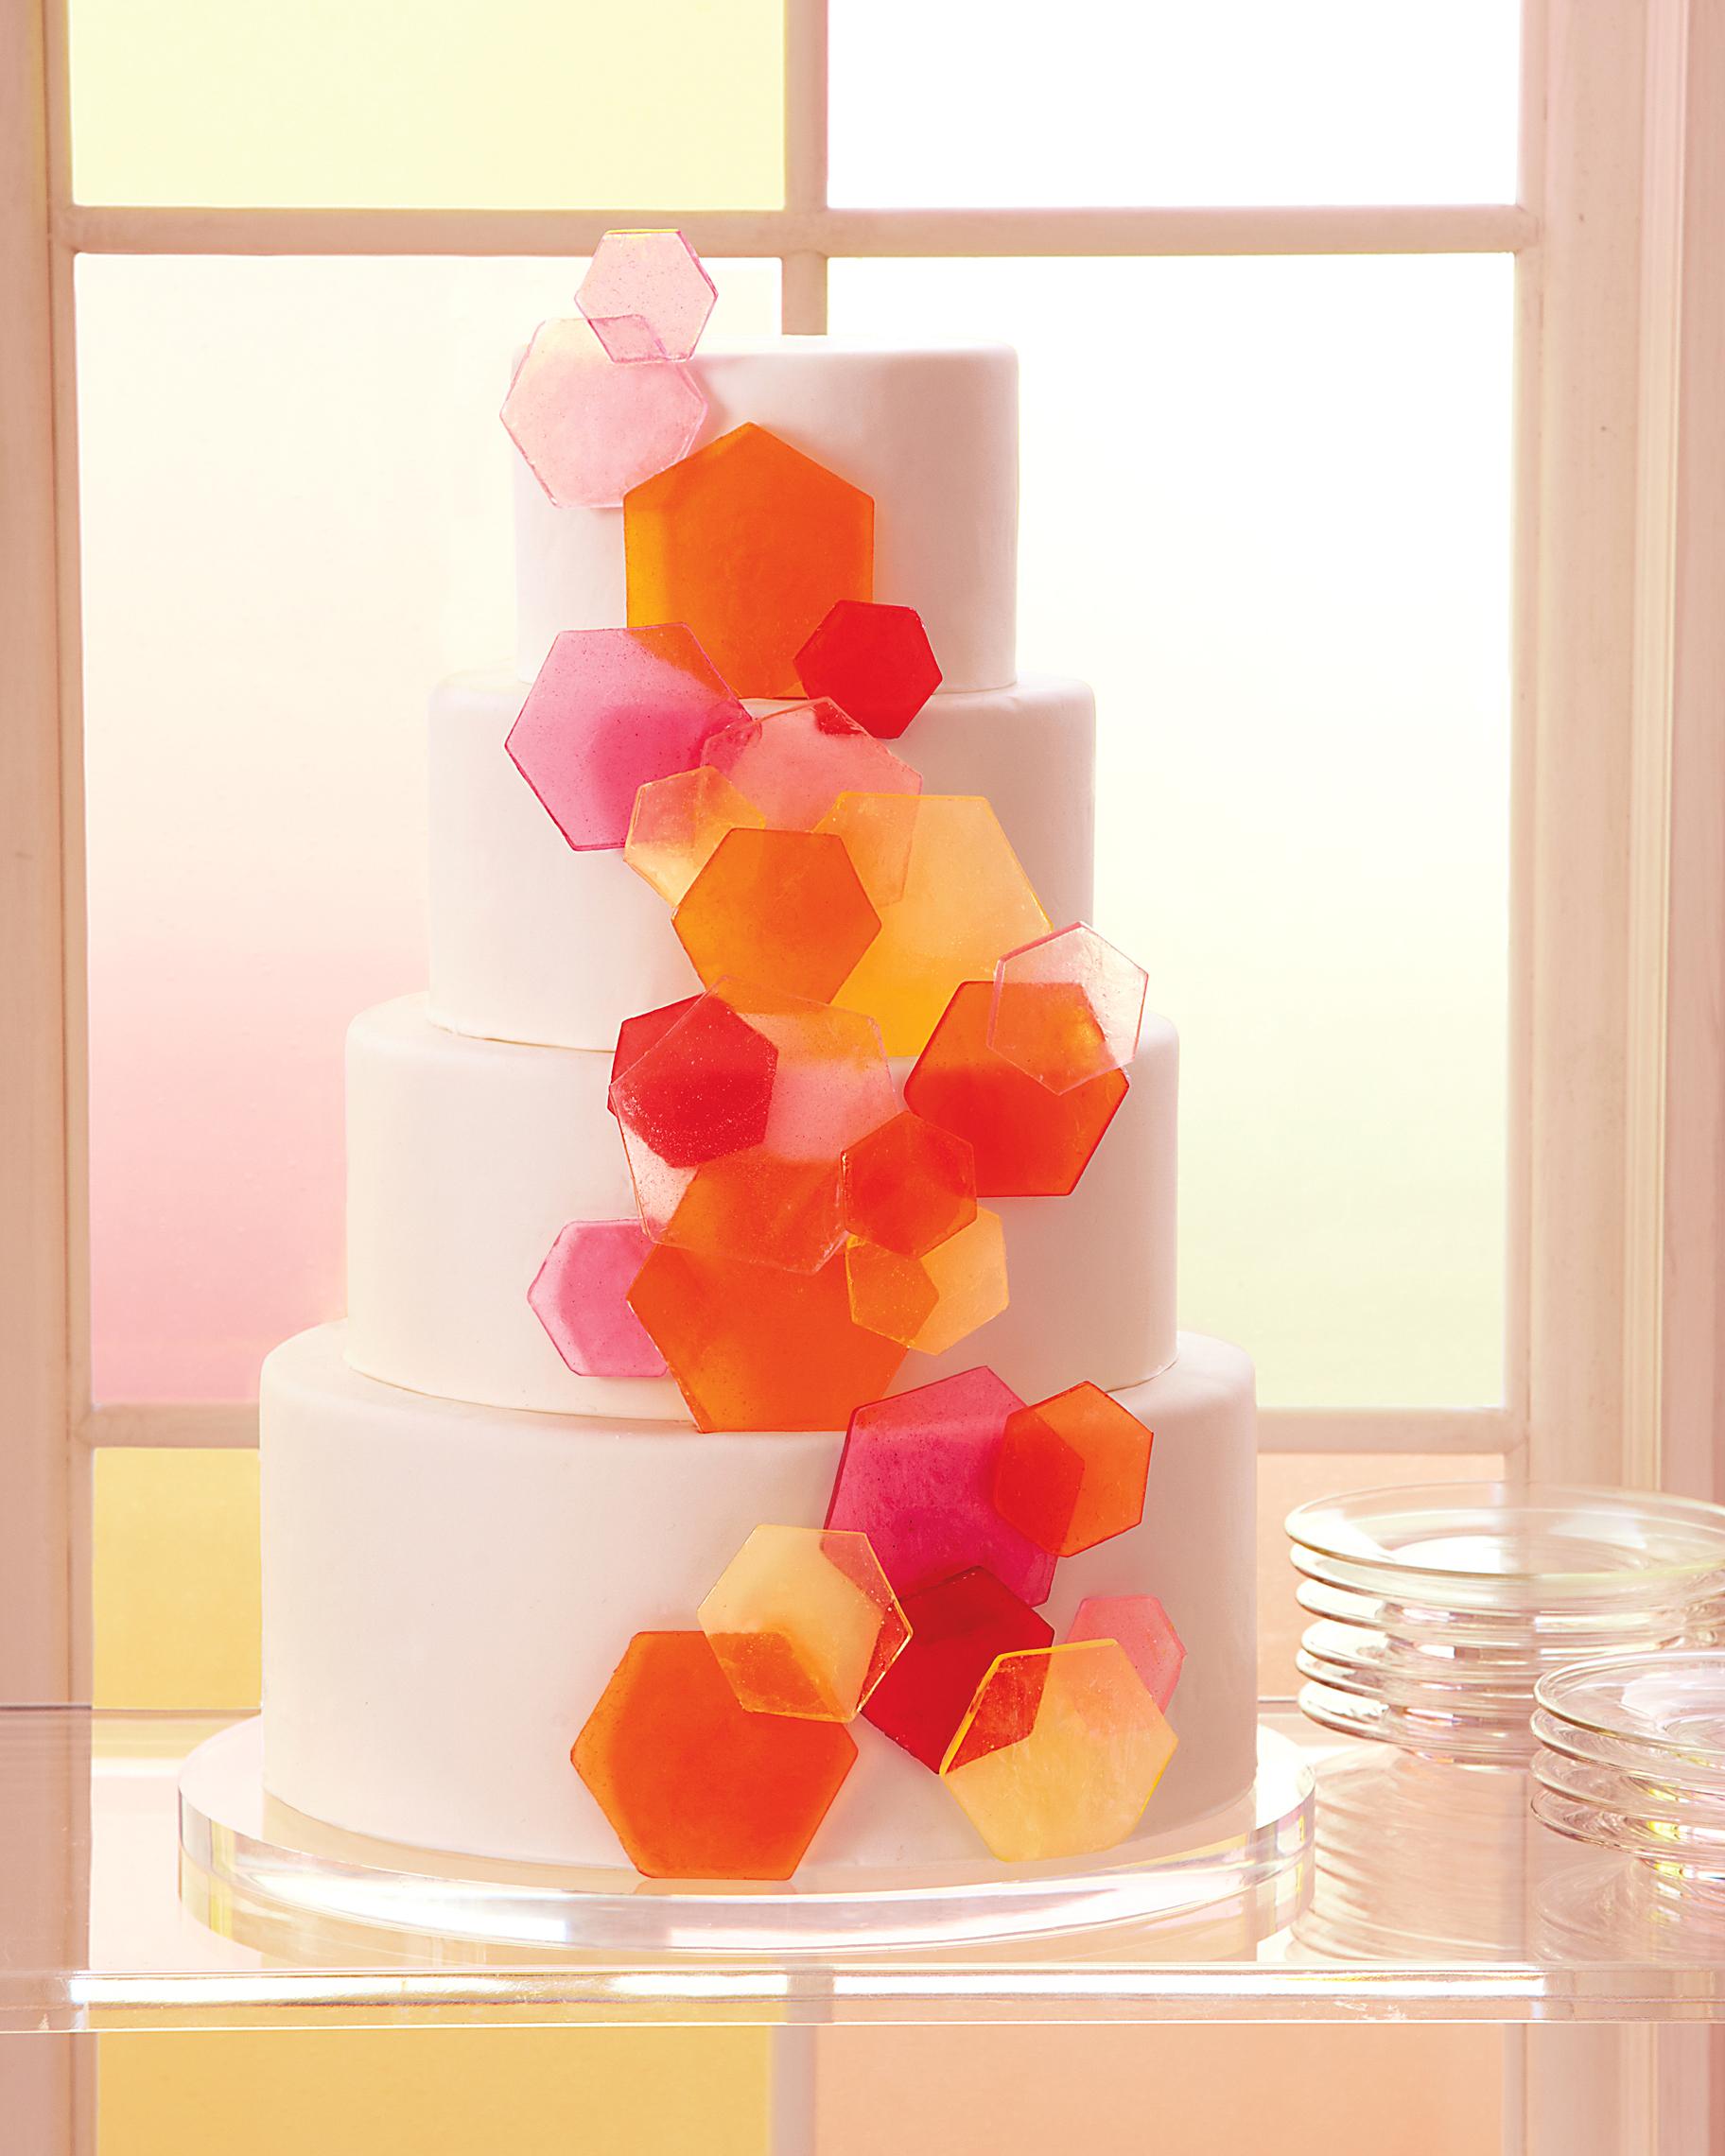 cake-0811mwd10754.jpg